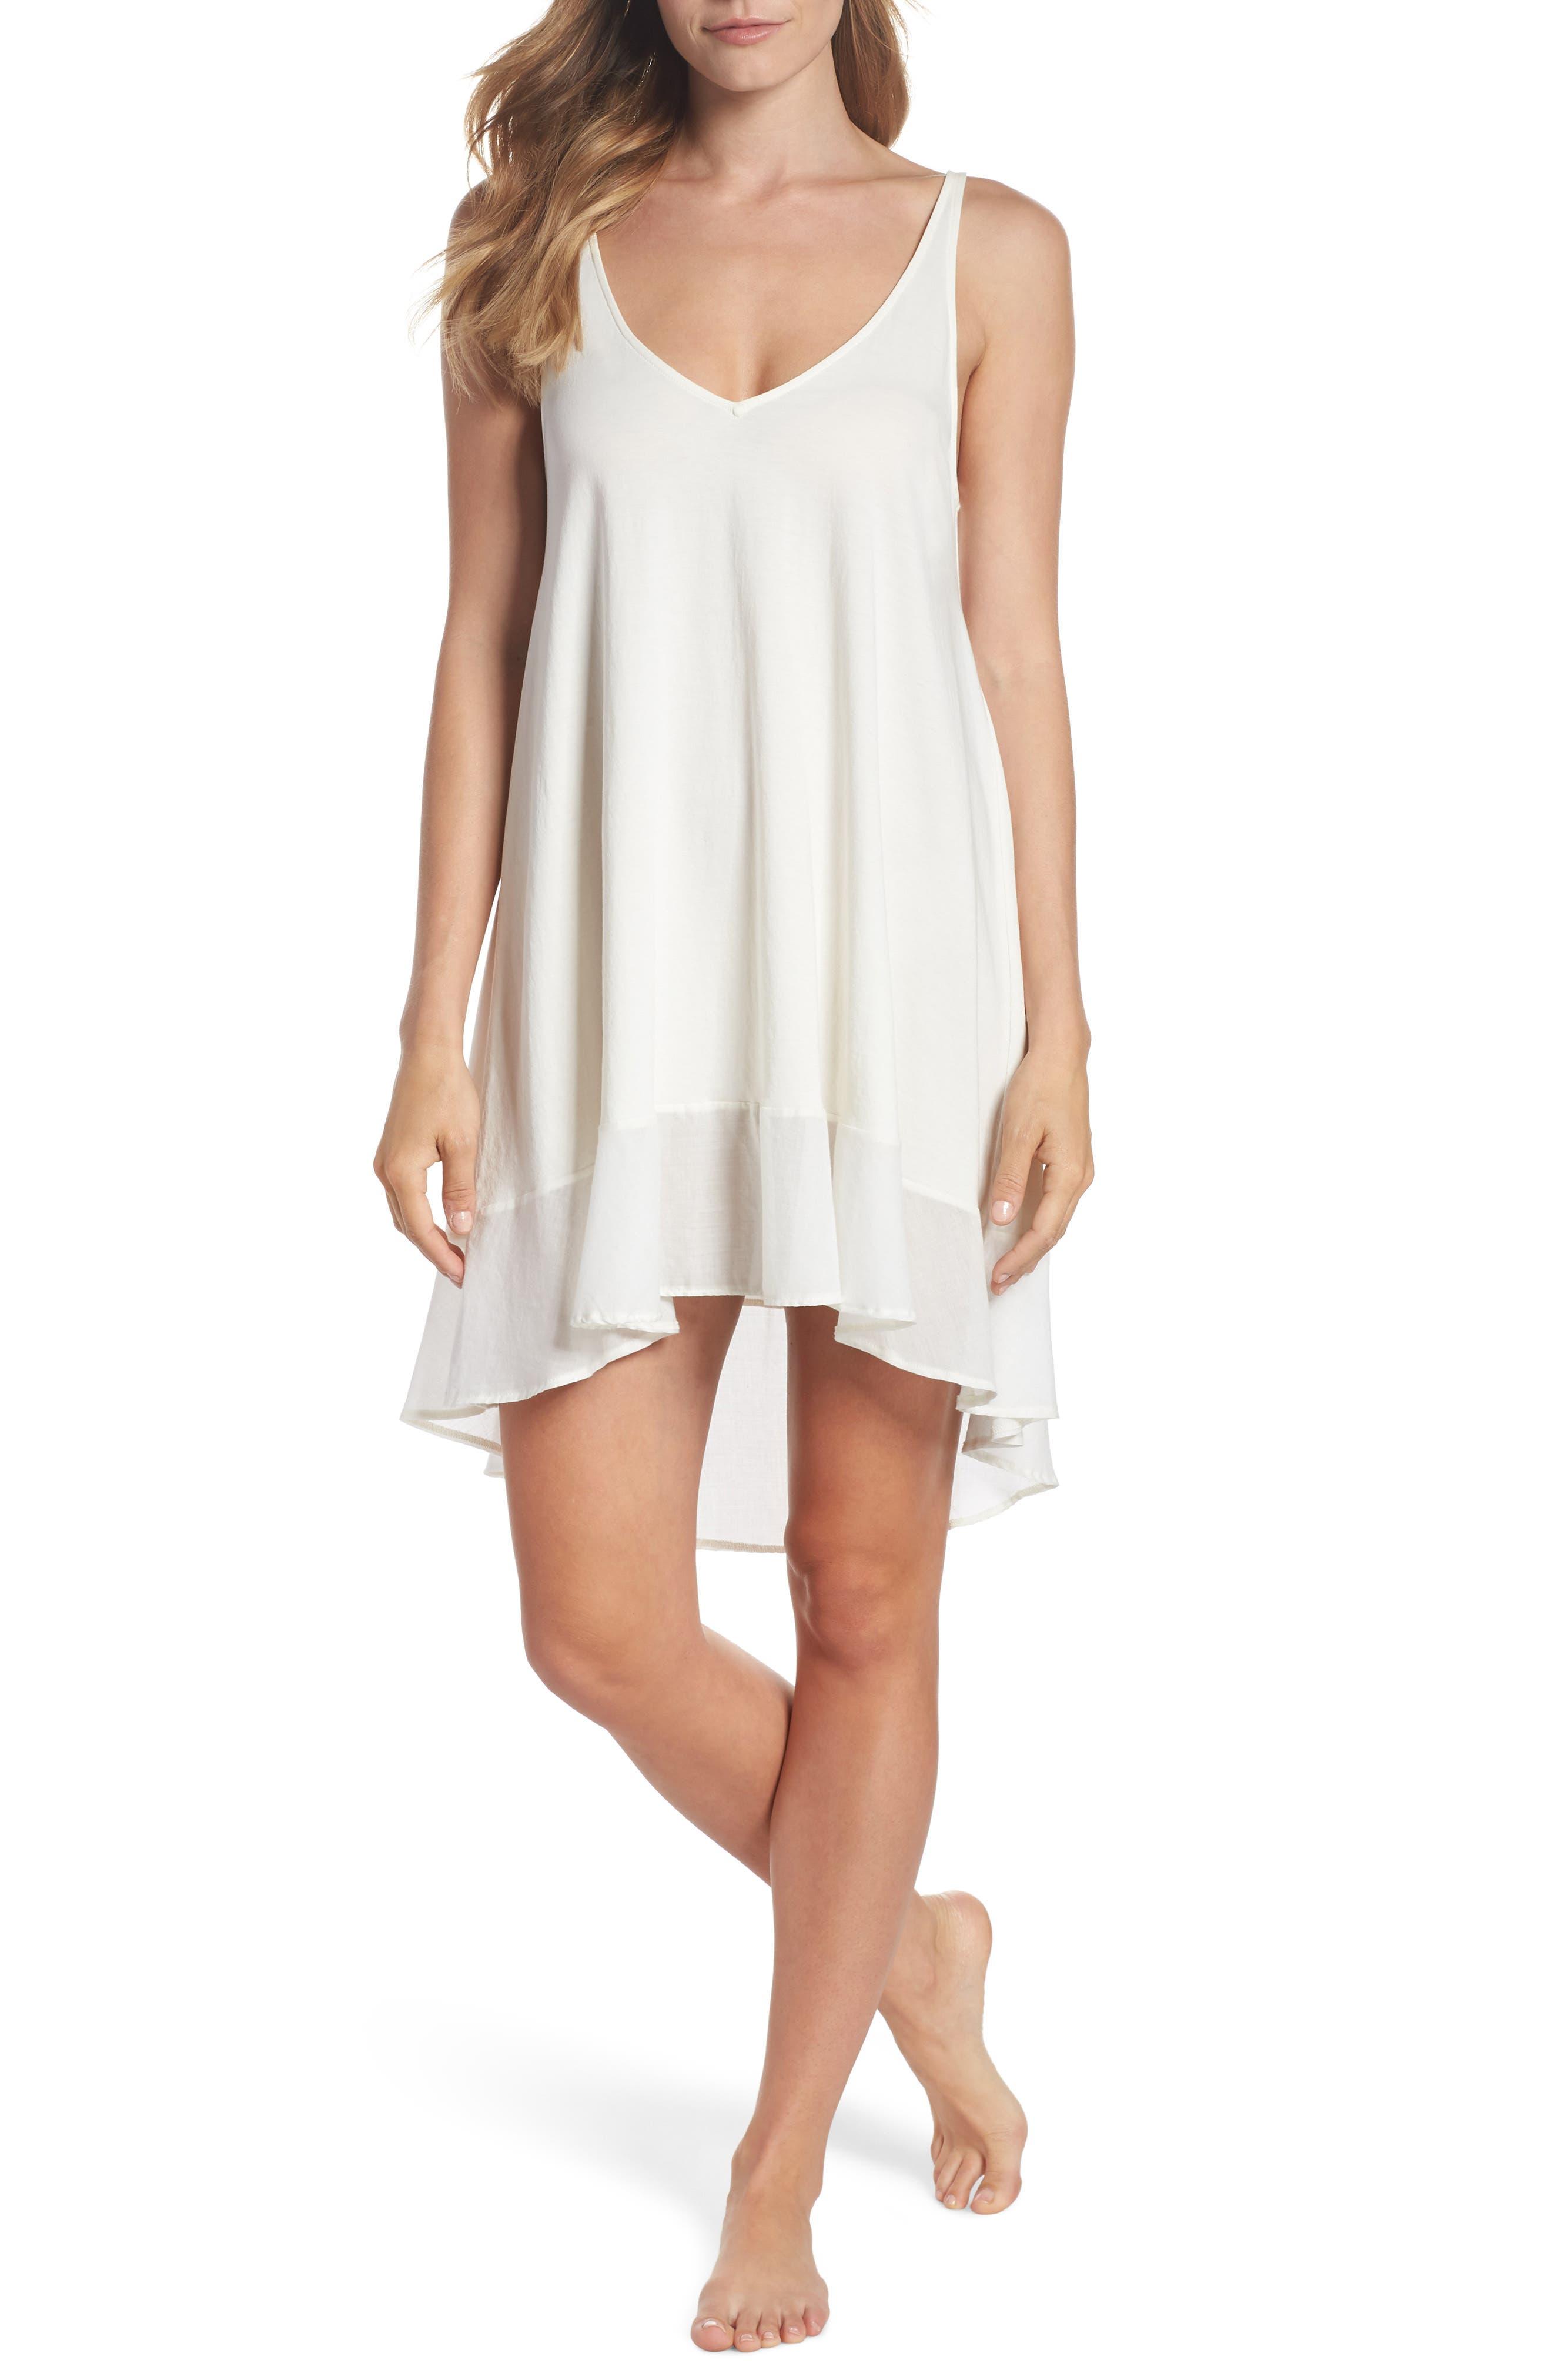 Bettina Pima Cotton Voile Nightgown,                             Main thumbnail 1, color,                             Gardenia